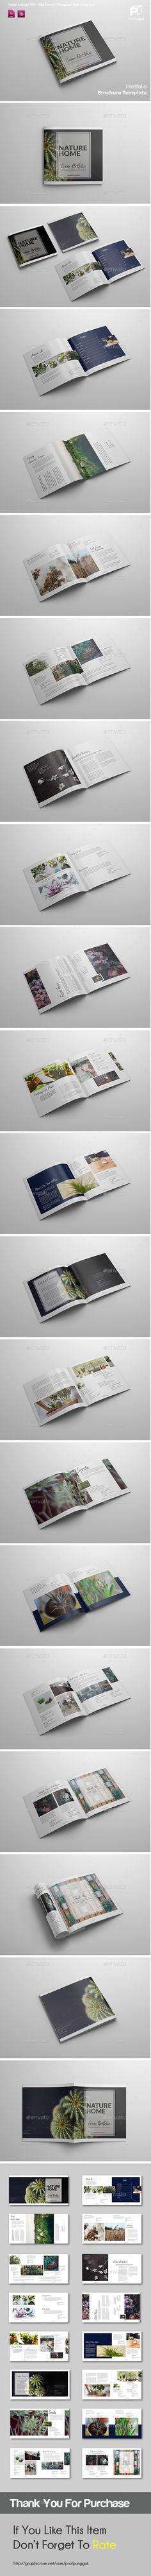 Square Brochure Vol.5  — InDesign Template #color #square • Download ➝ https://graphicriver.net/item/square-brochure-vol5/18438149?ref=pxcr